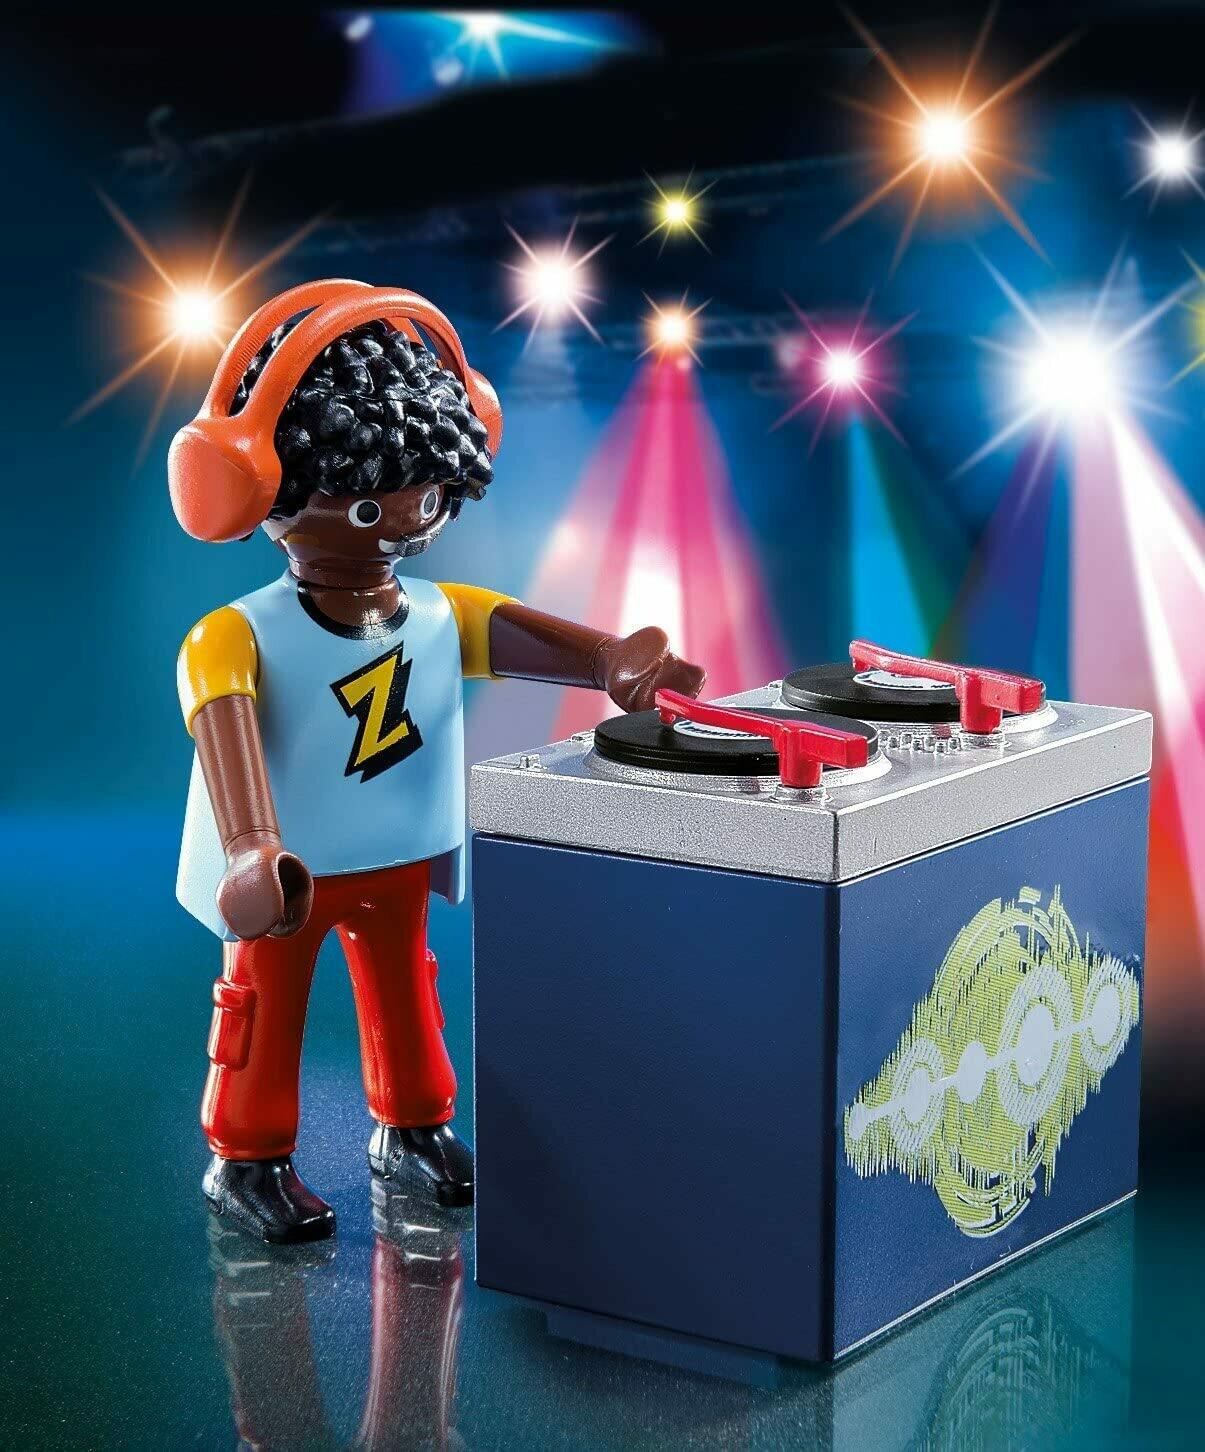 Playmobil: Dj (Discontinued)